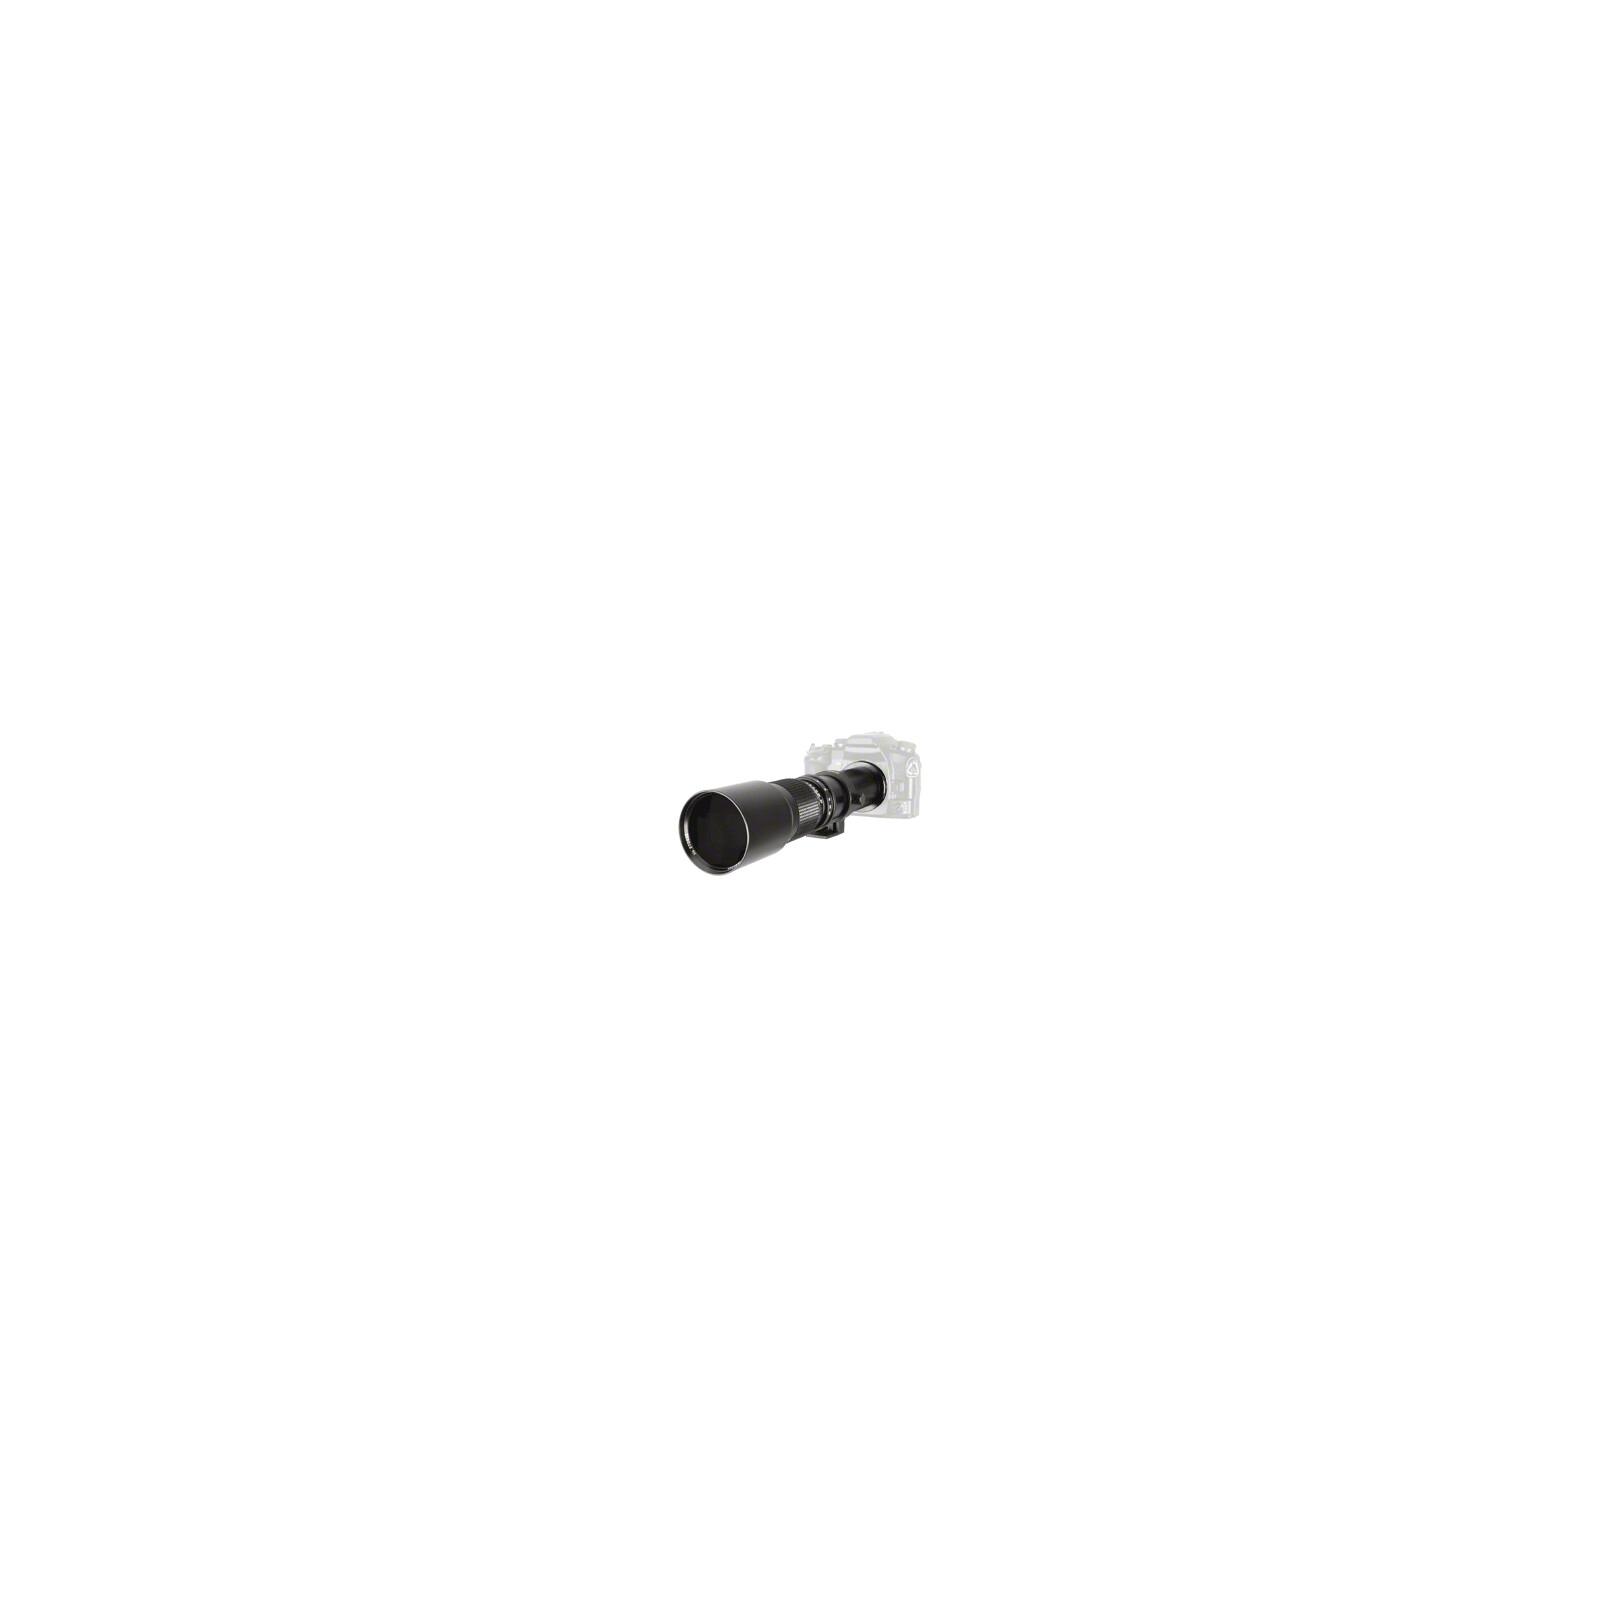 walimex 500/8,0 DSLR M42  + UV Filter